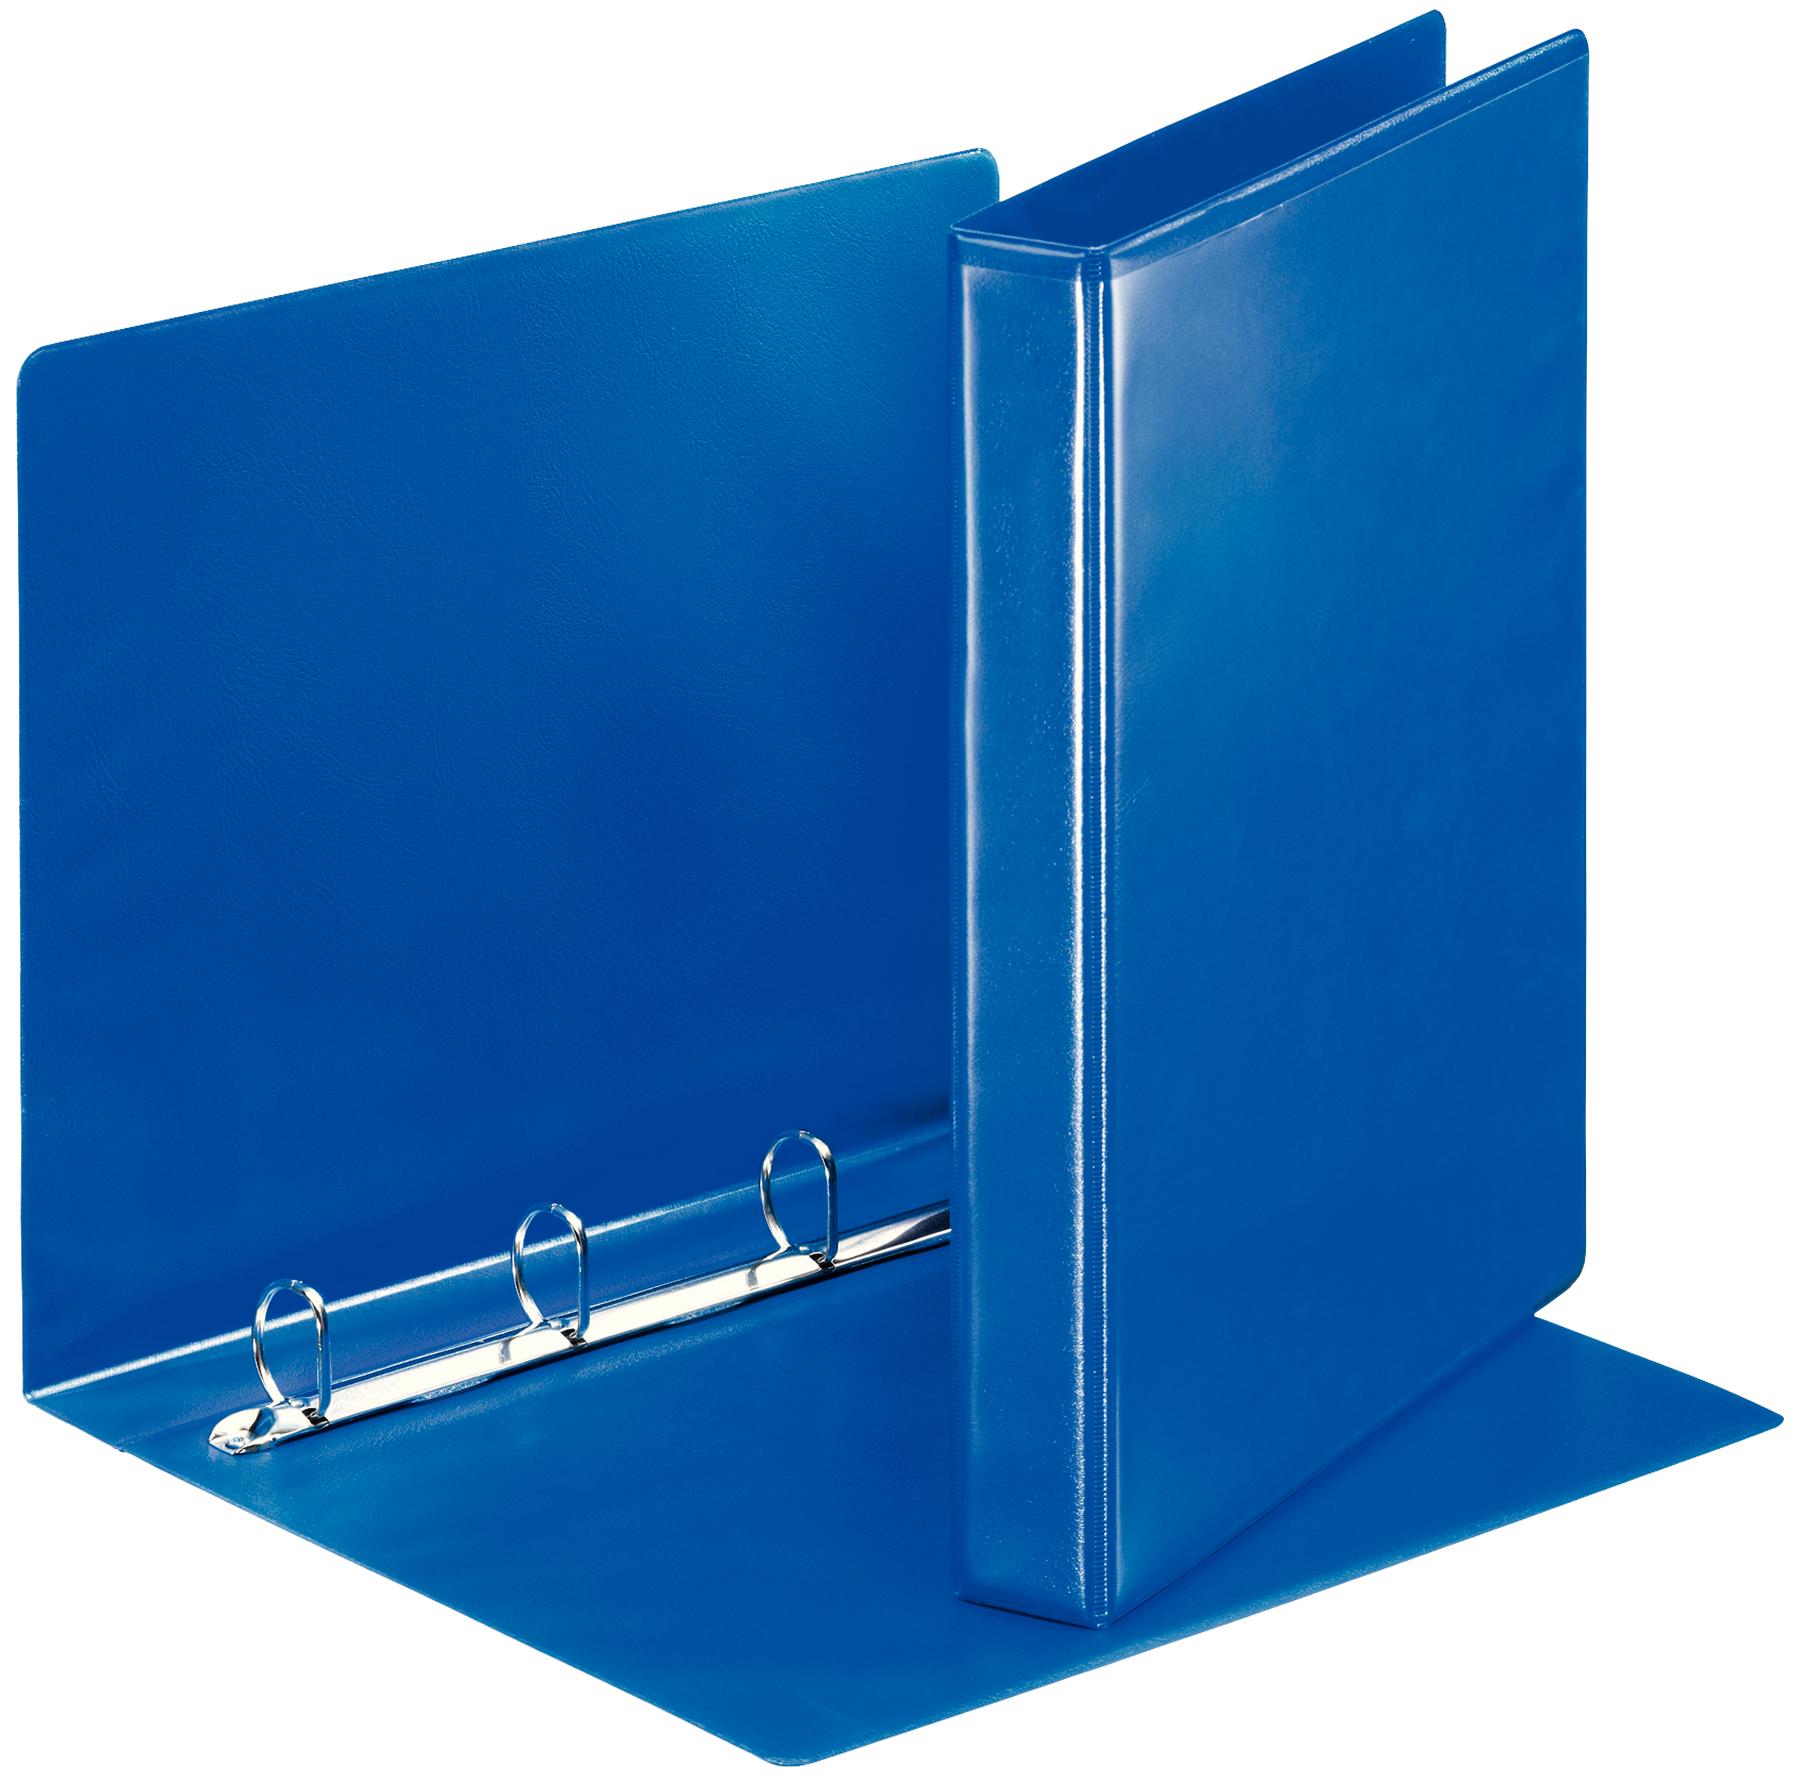 Esselte Essentials Pres Binder A4 25mm 4 D-Ring Blue PK10